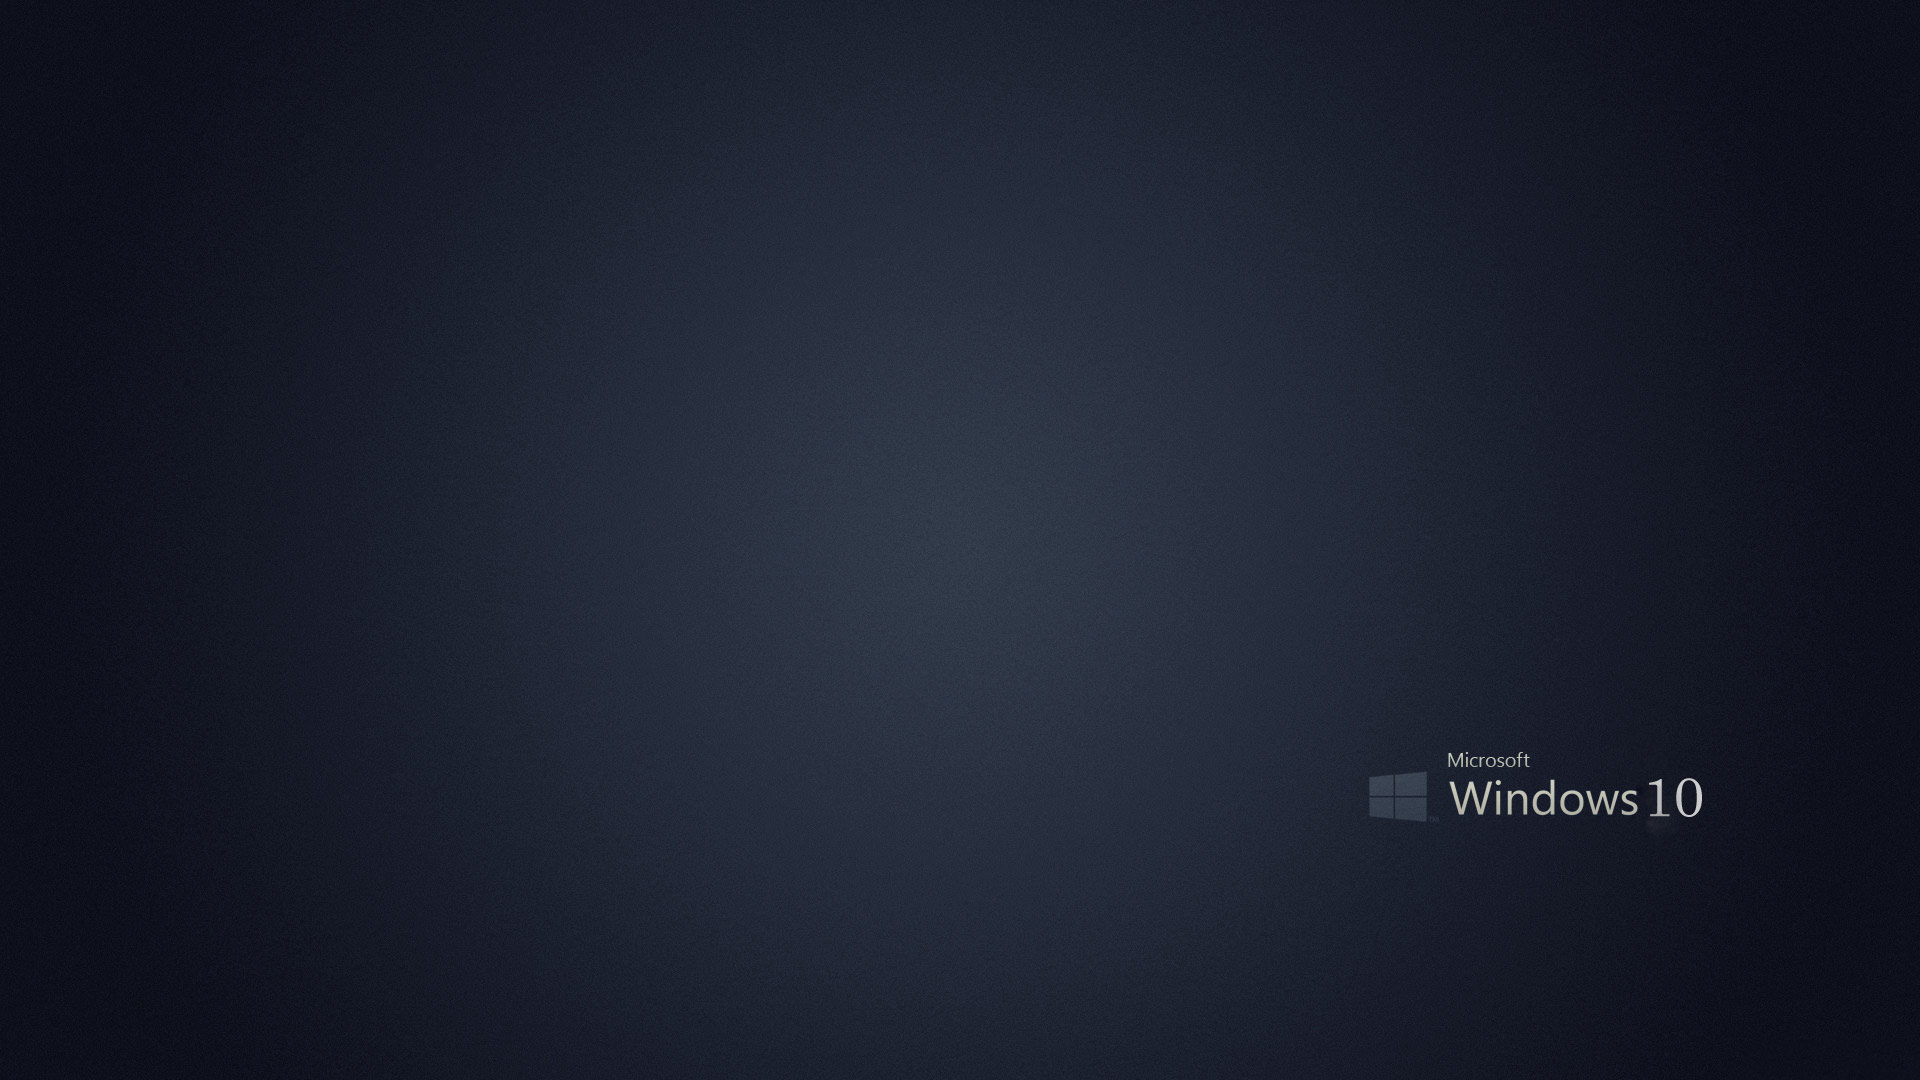 HD Windows 10 Wallpaper Black Hd Windows 10 Wallpaper